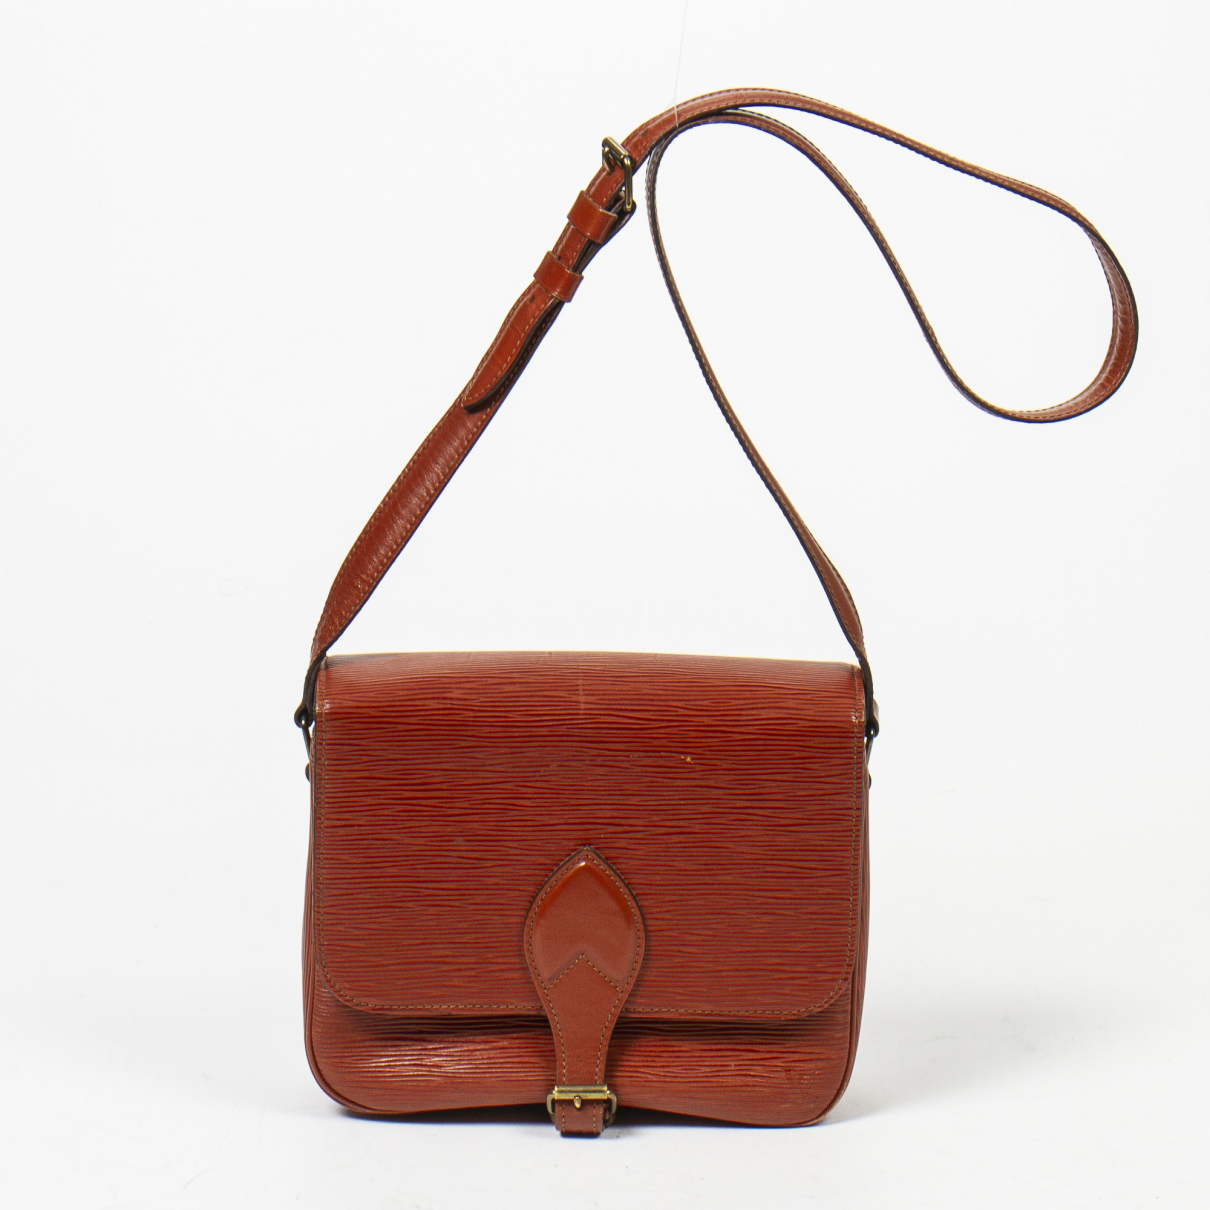 Louis Vuitton Cartouchiere Handtasche in  Khaki Leder